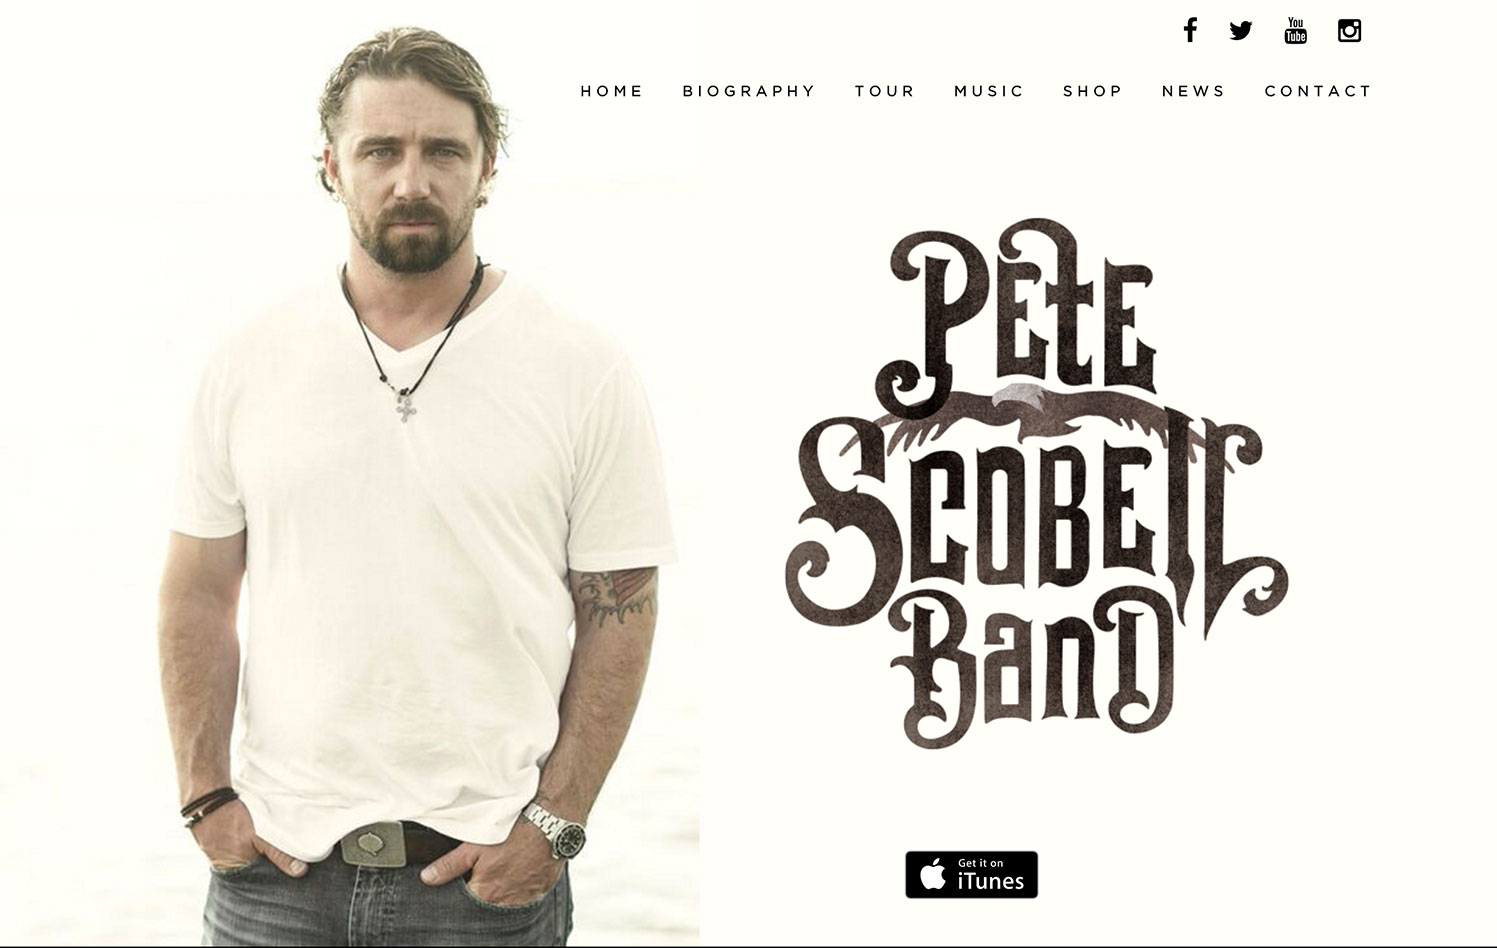 Pete Scobell